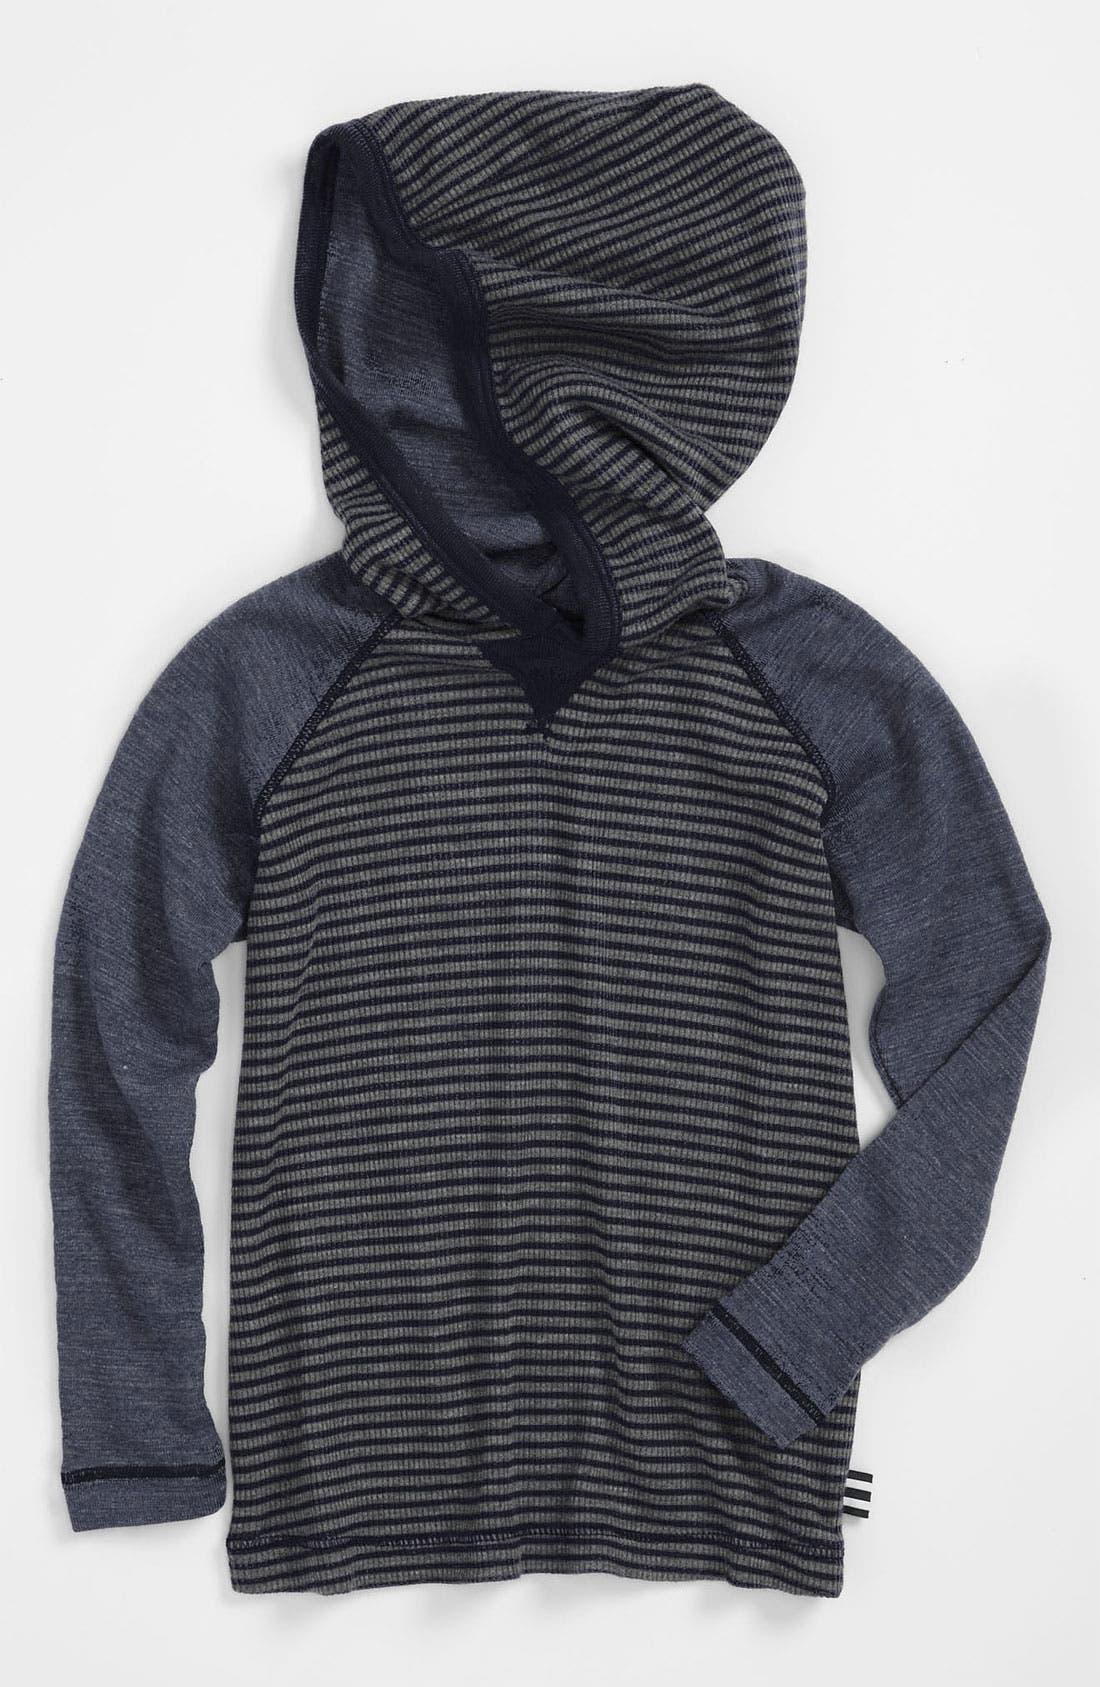 Alternate Image 1 Selected - Splendid 'Mini Stripe' Thermal Hooded Top (Toddler)